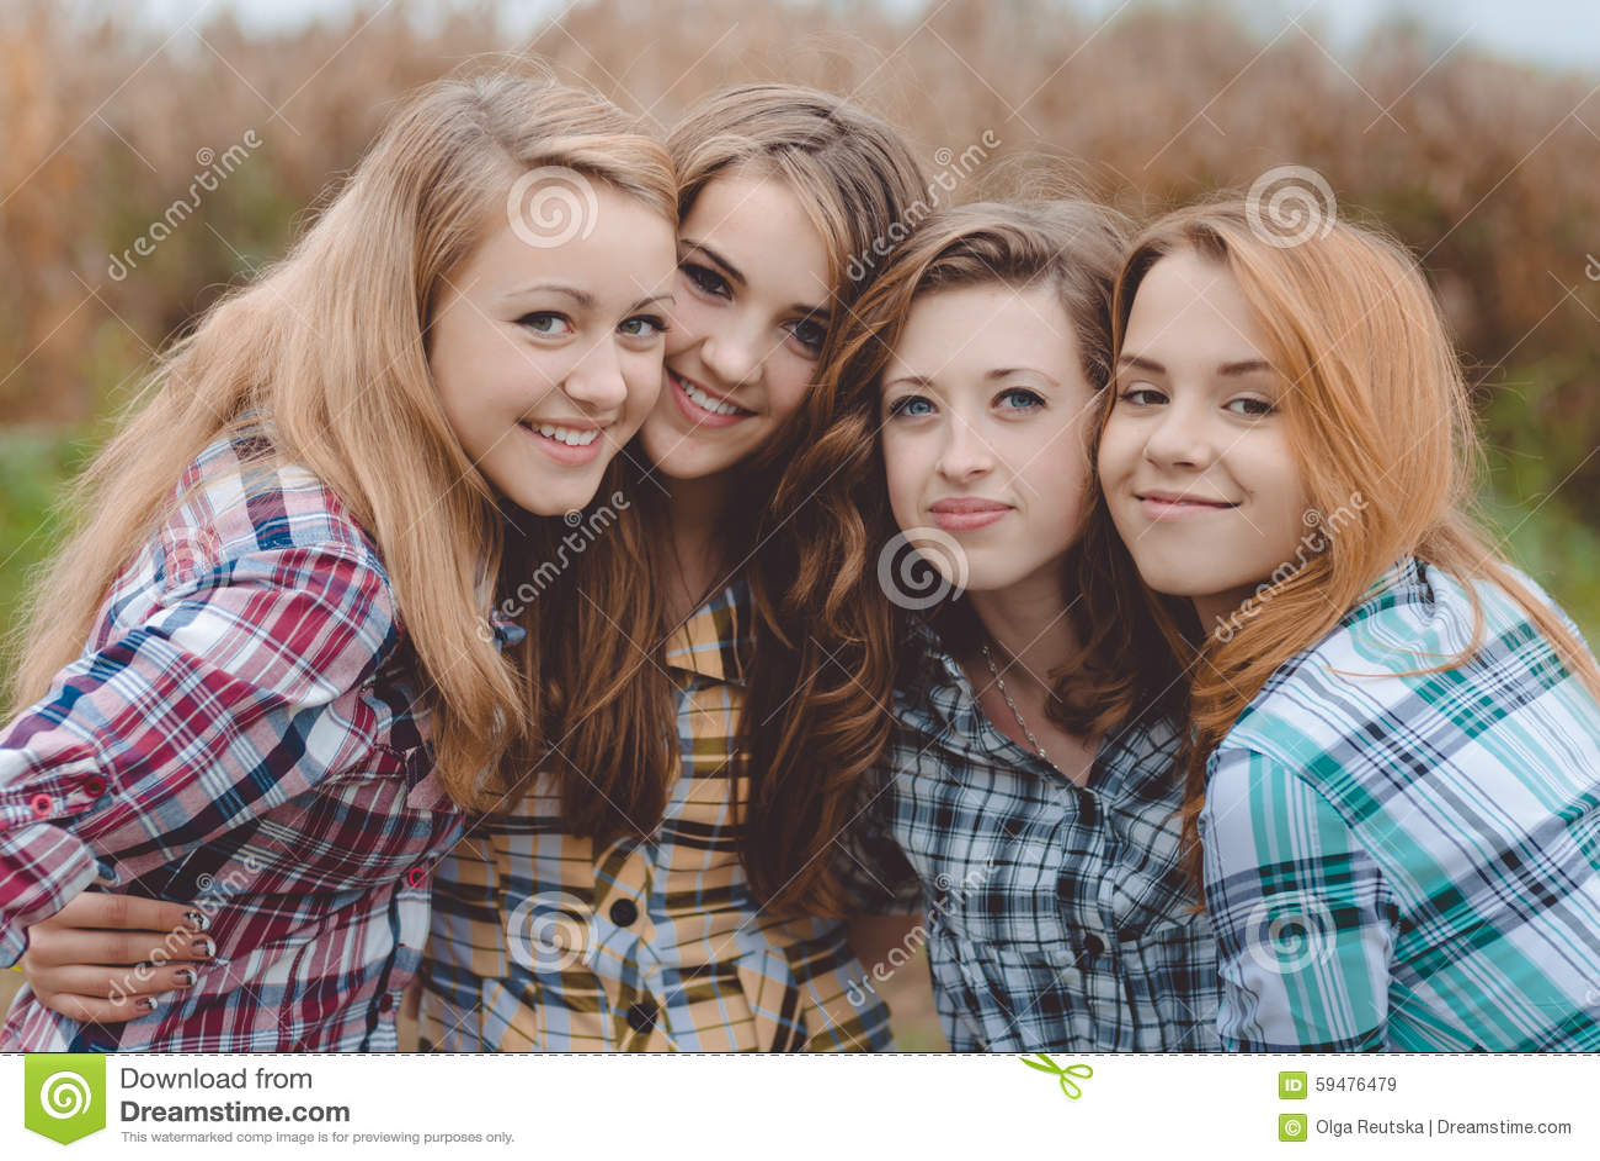 Amazing girls fun begins 9